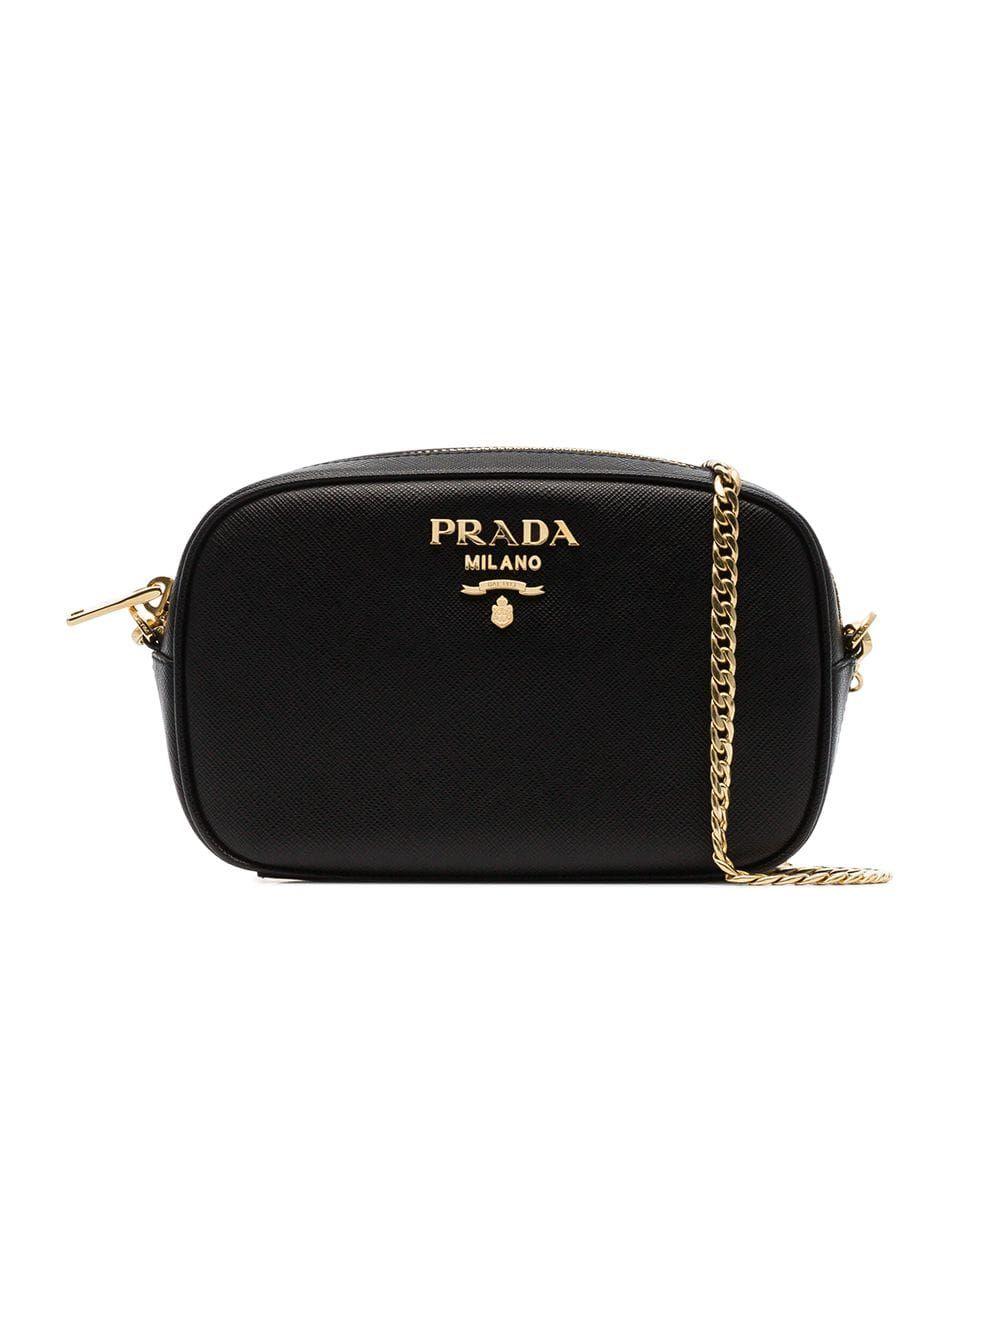 33780d841243cd PRADA PRADA BLACK SAFFIANO LEATHER BELT BAG. #prada #bags #leather #belt  bags